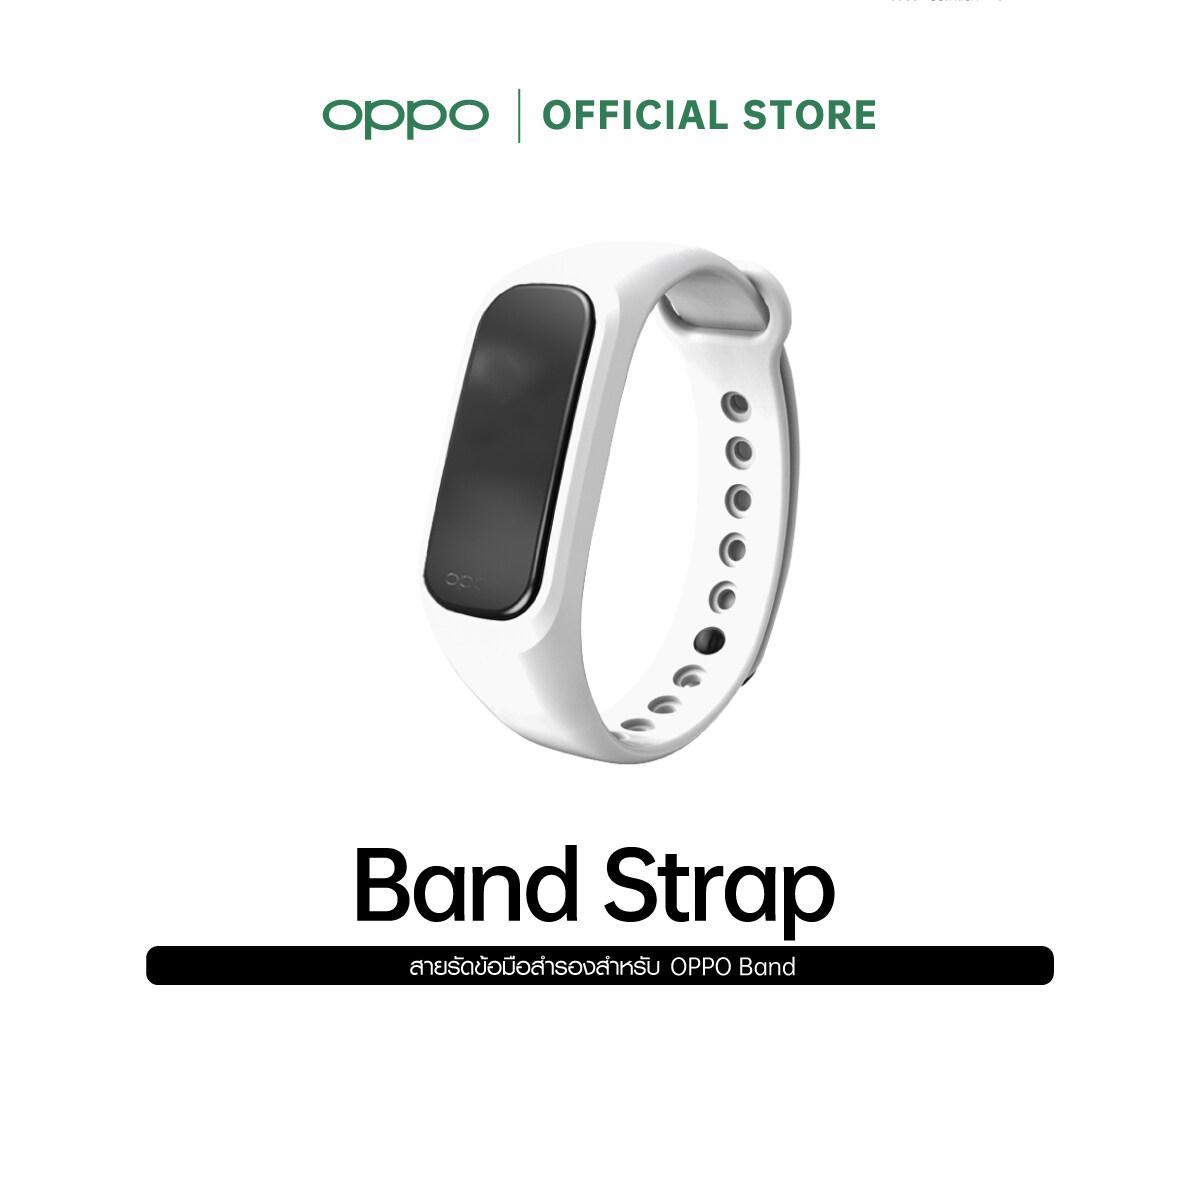 Band Strap สายรัดข้อมือสำรองสำหรับ Oppo Band *เฉพาะสายเท่านั้น*.